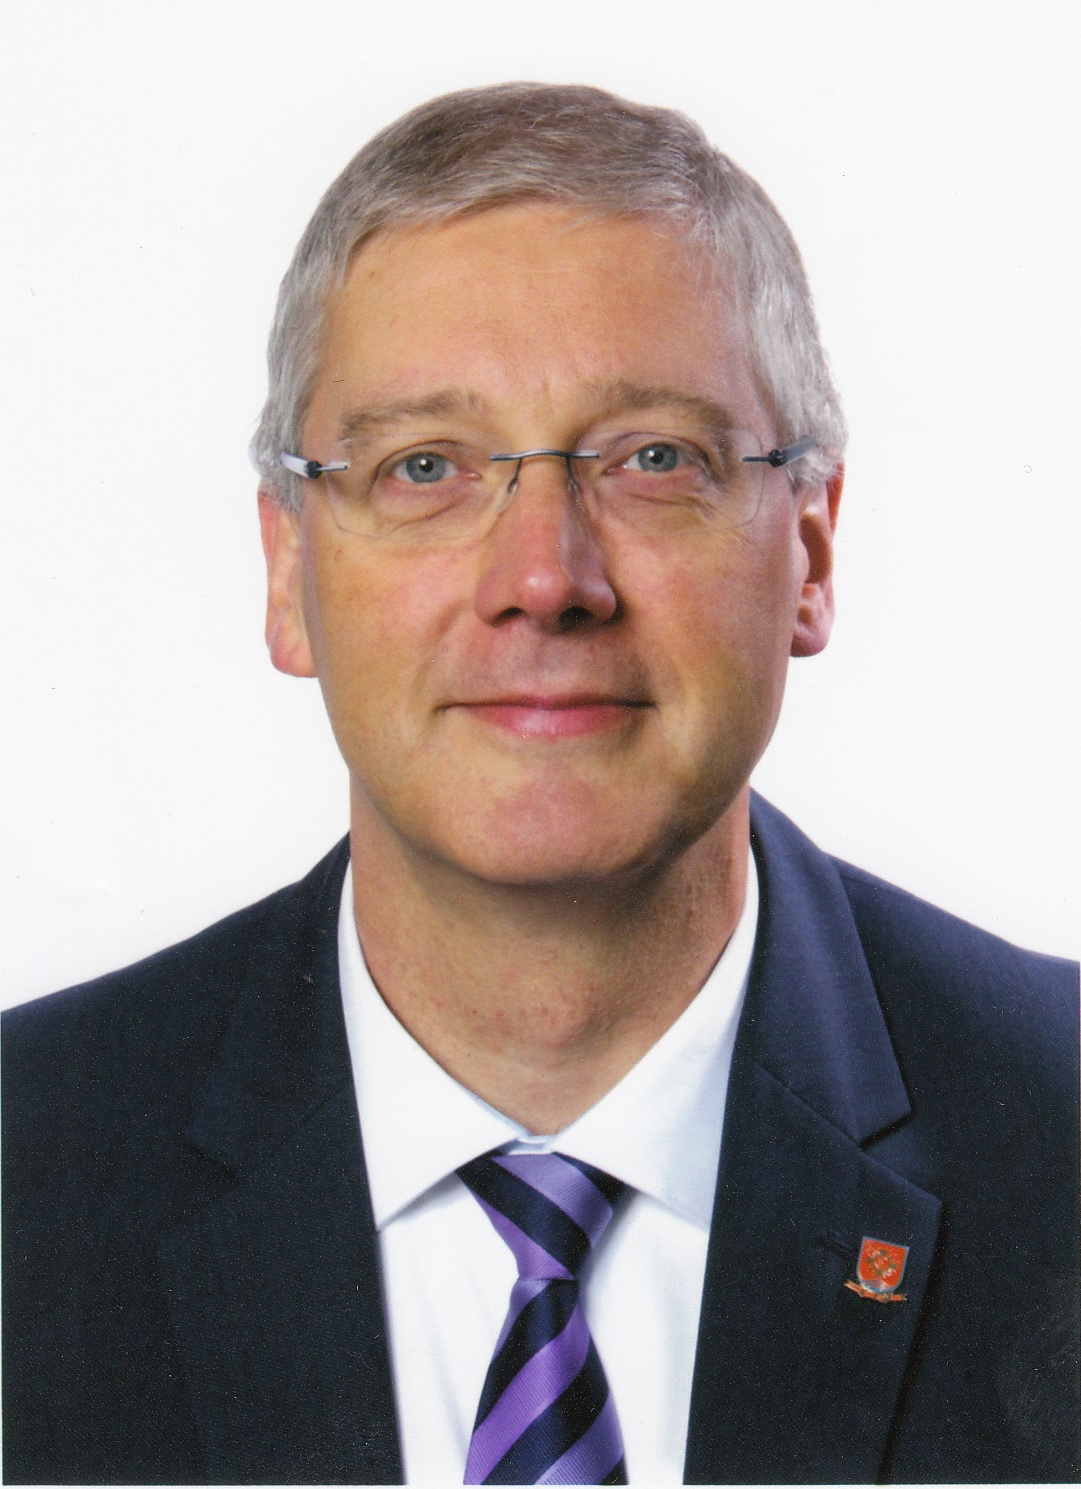 Hans Boussery